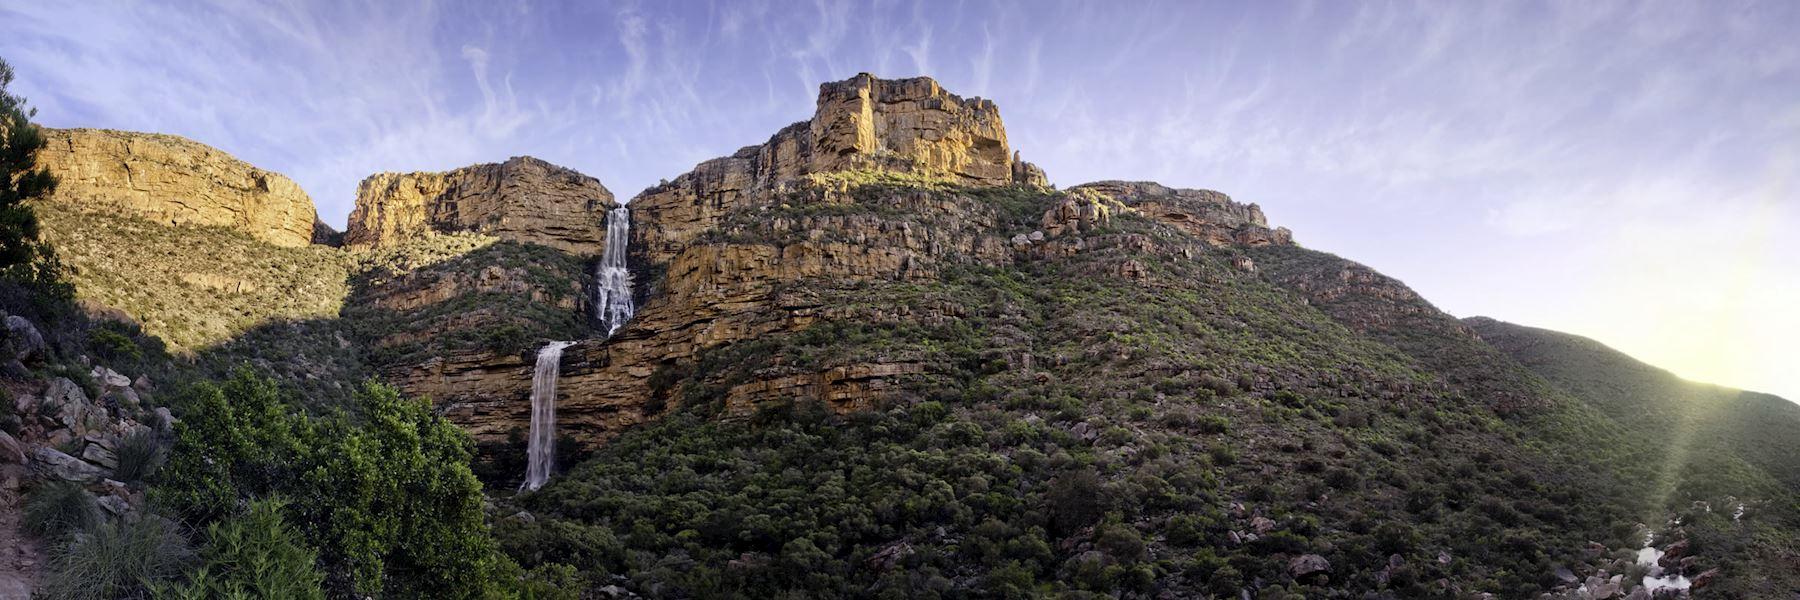 Visit Namaqualand, South Africa